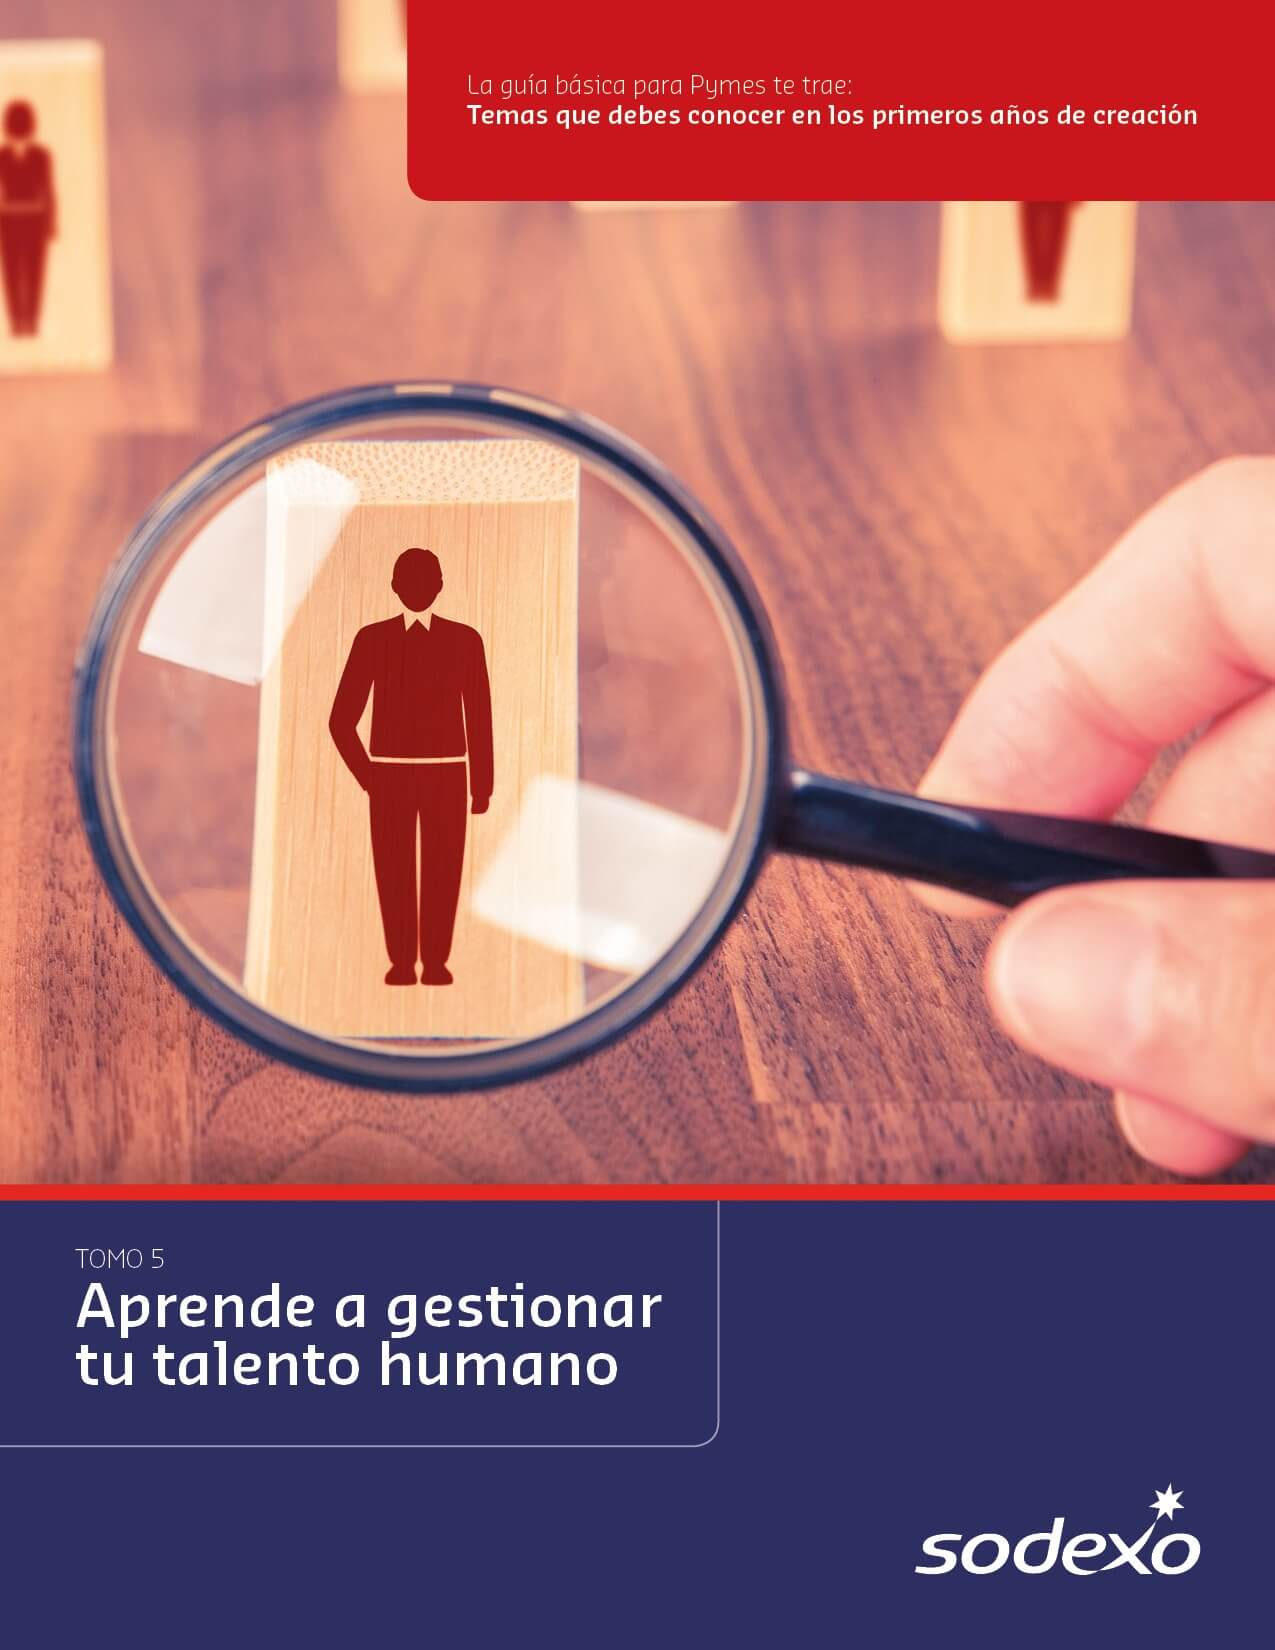 Aprende a gestionar tu talento humano